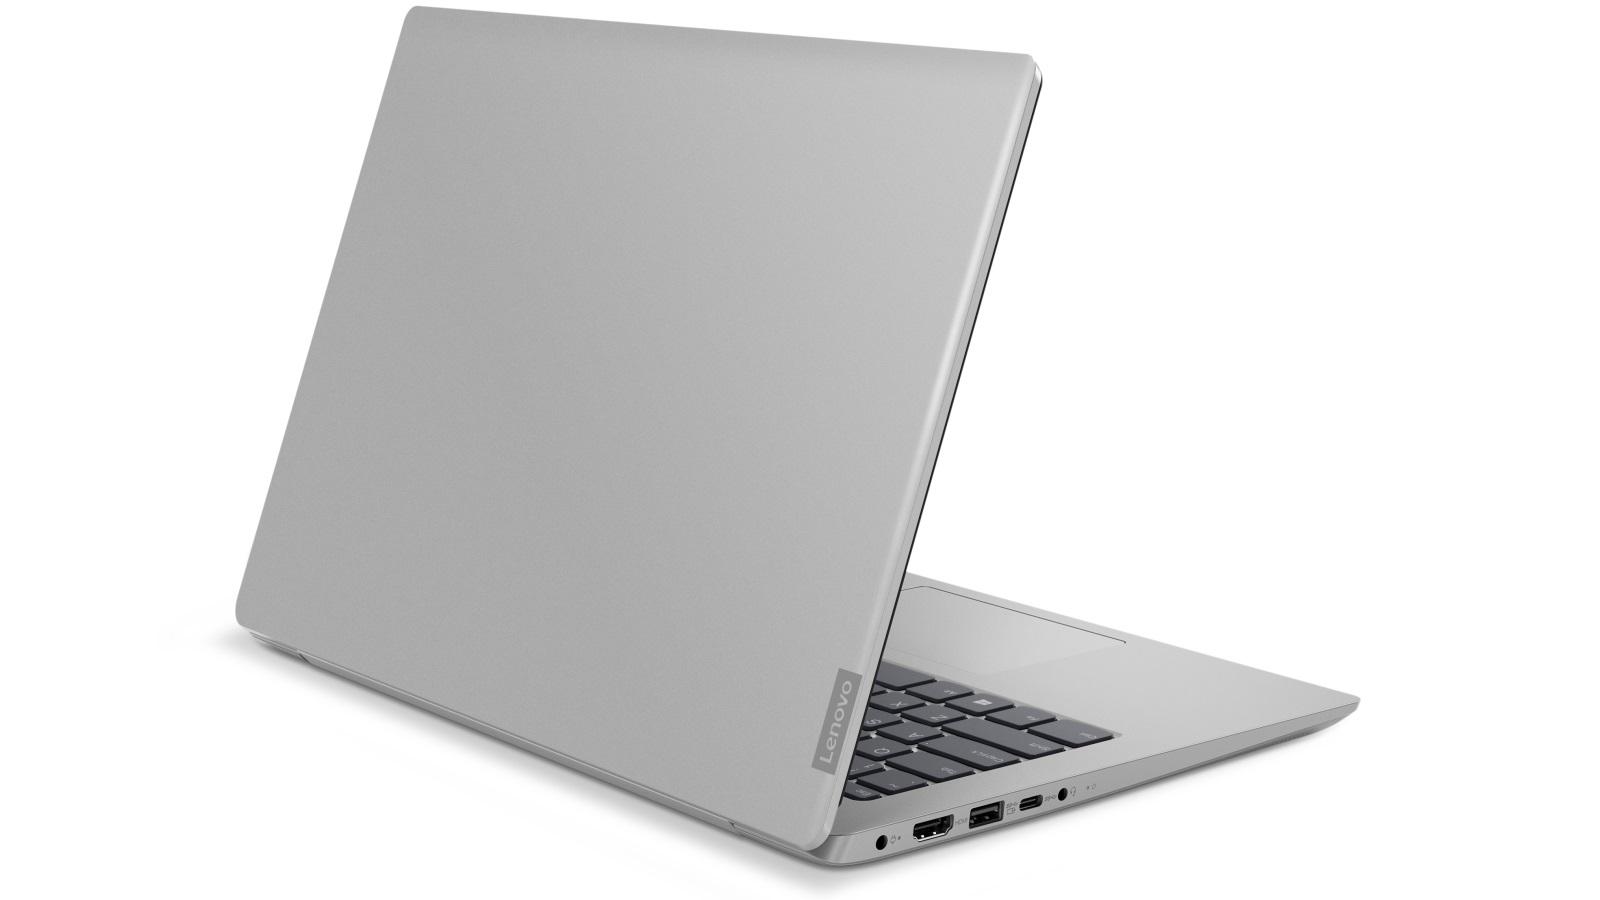 Buy Lenovo Ideapad 330S 156 Inch Laptop Harvey Norman AU